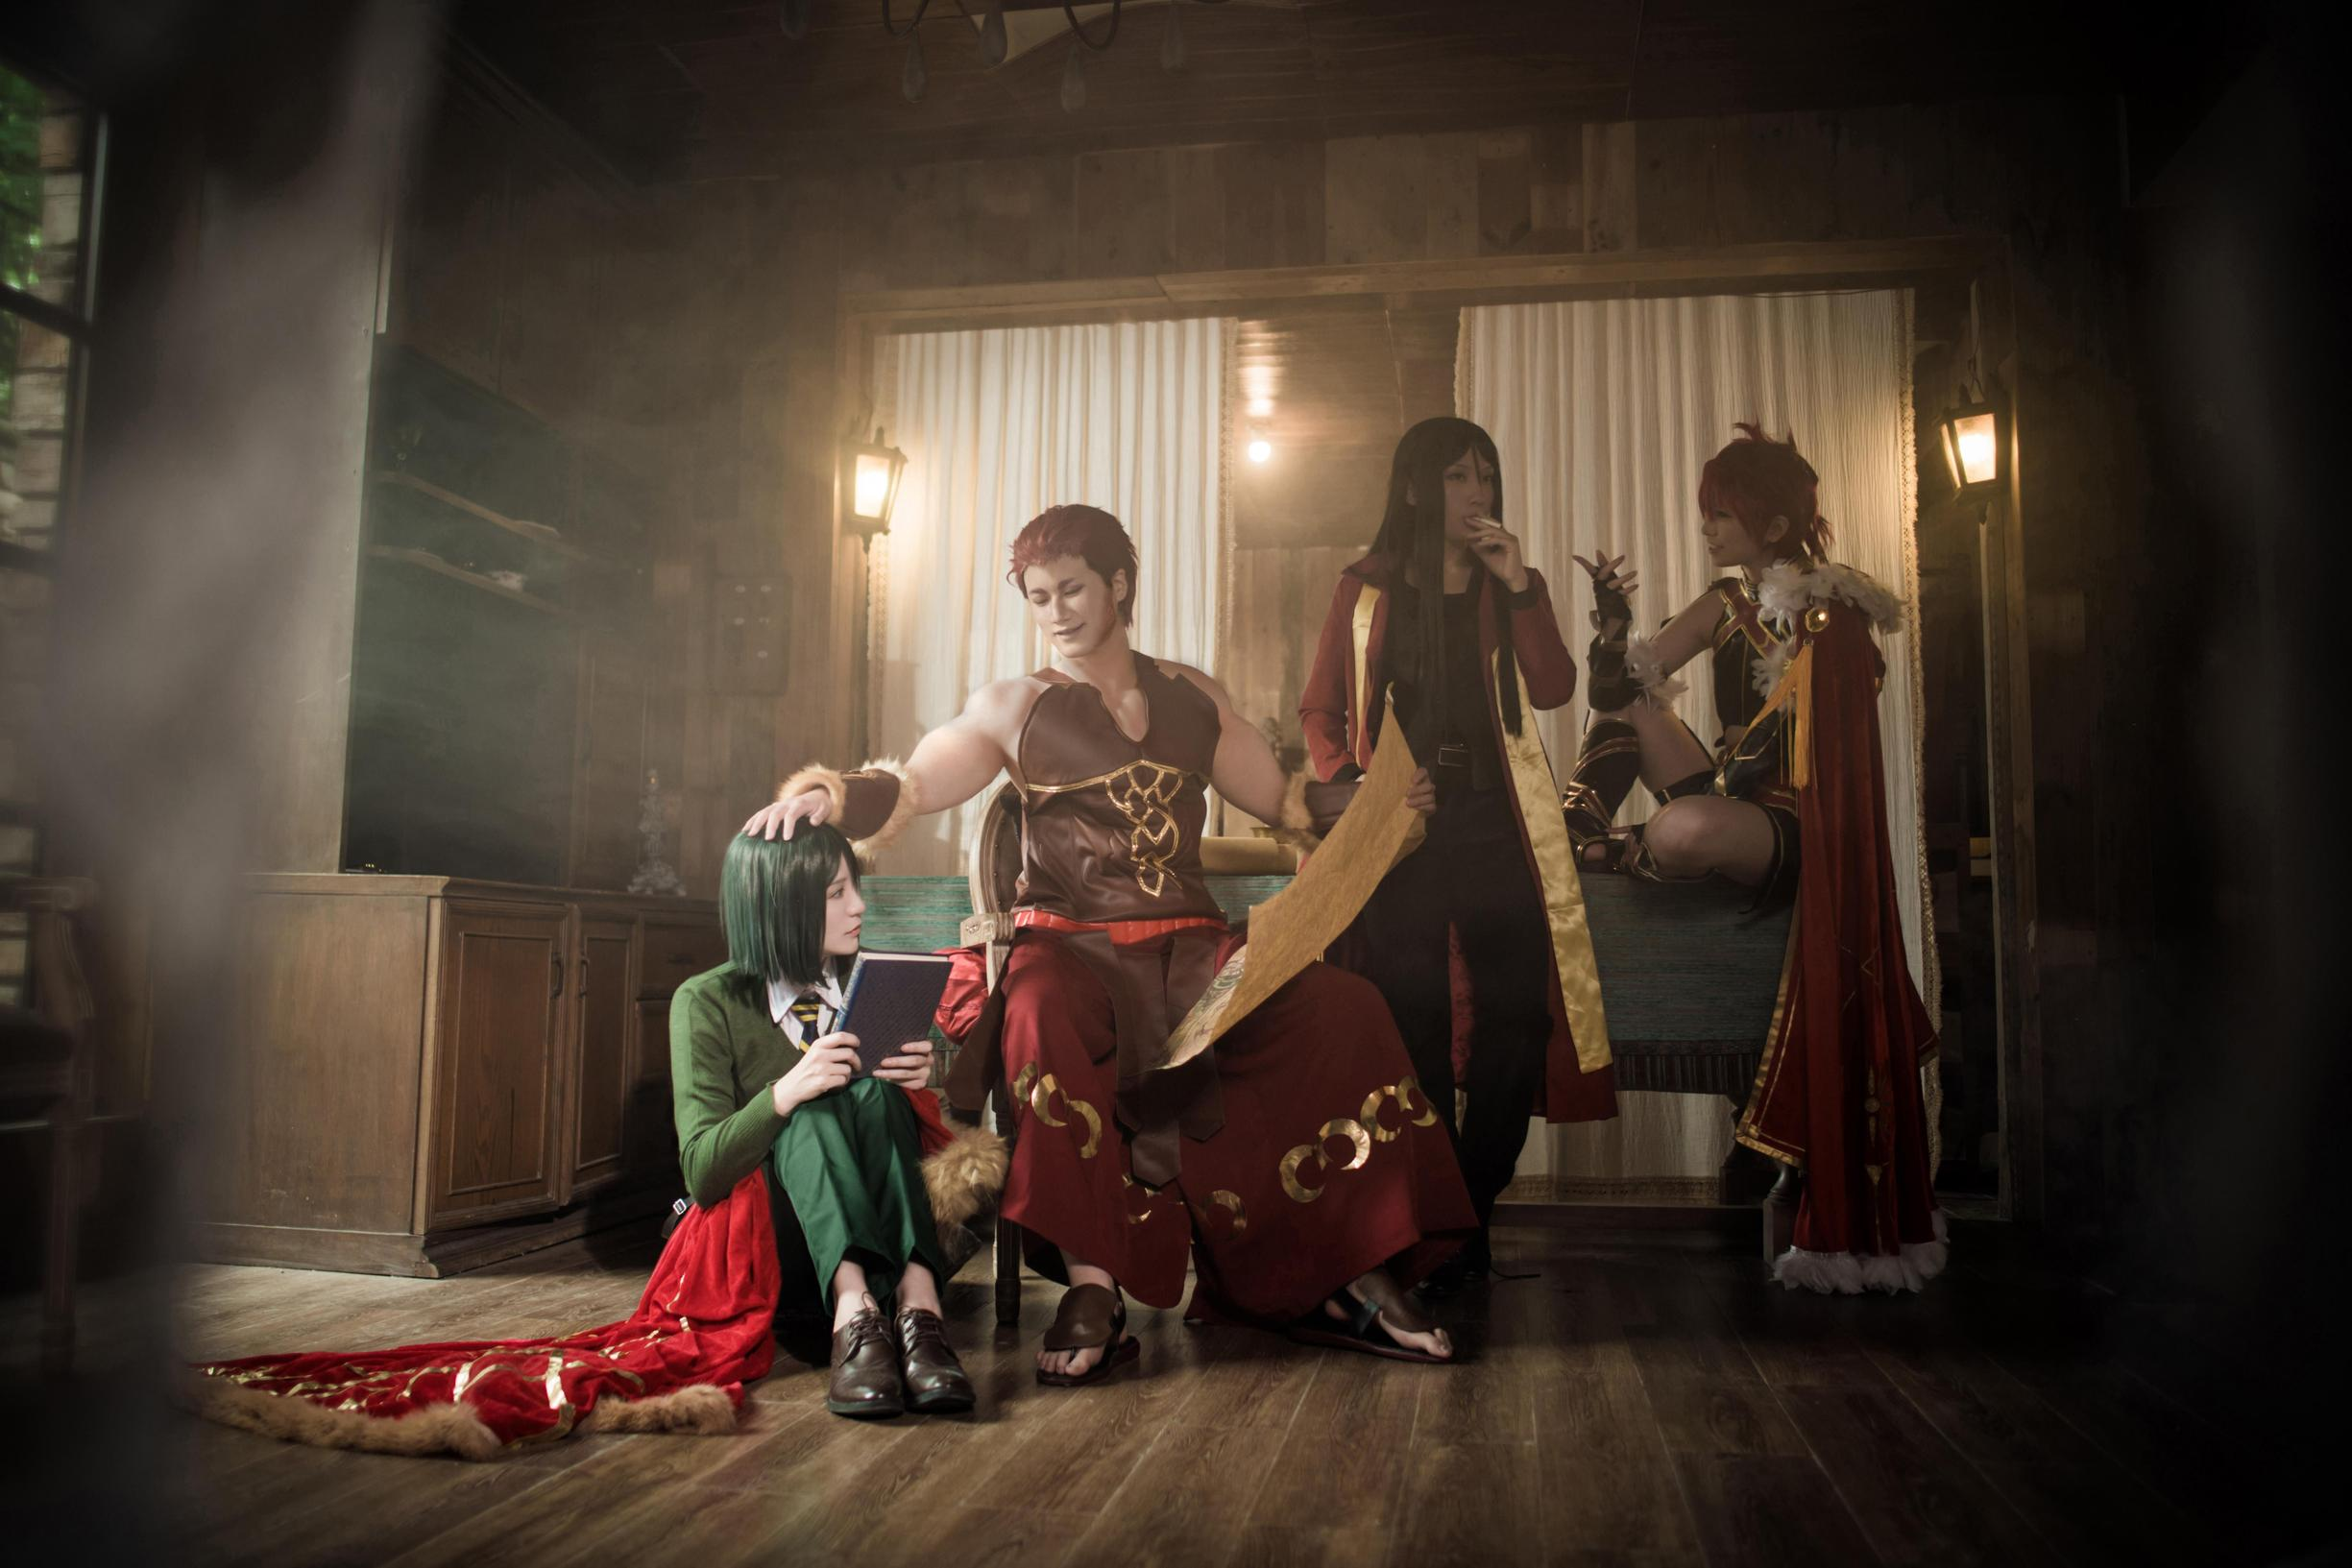 《FATE/GRAND ORDER》梅罗cosplay【CN:椰子也是叶砸】 -cosplay化妆教程图片插图